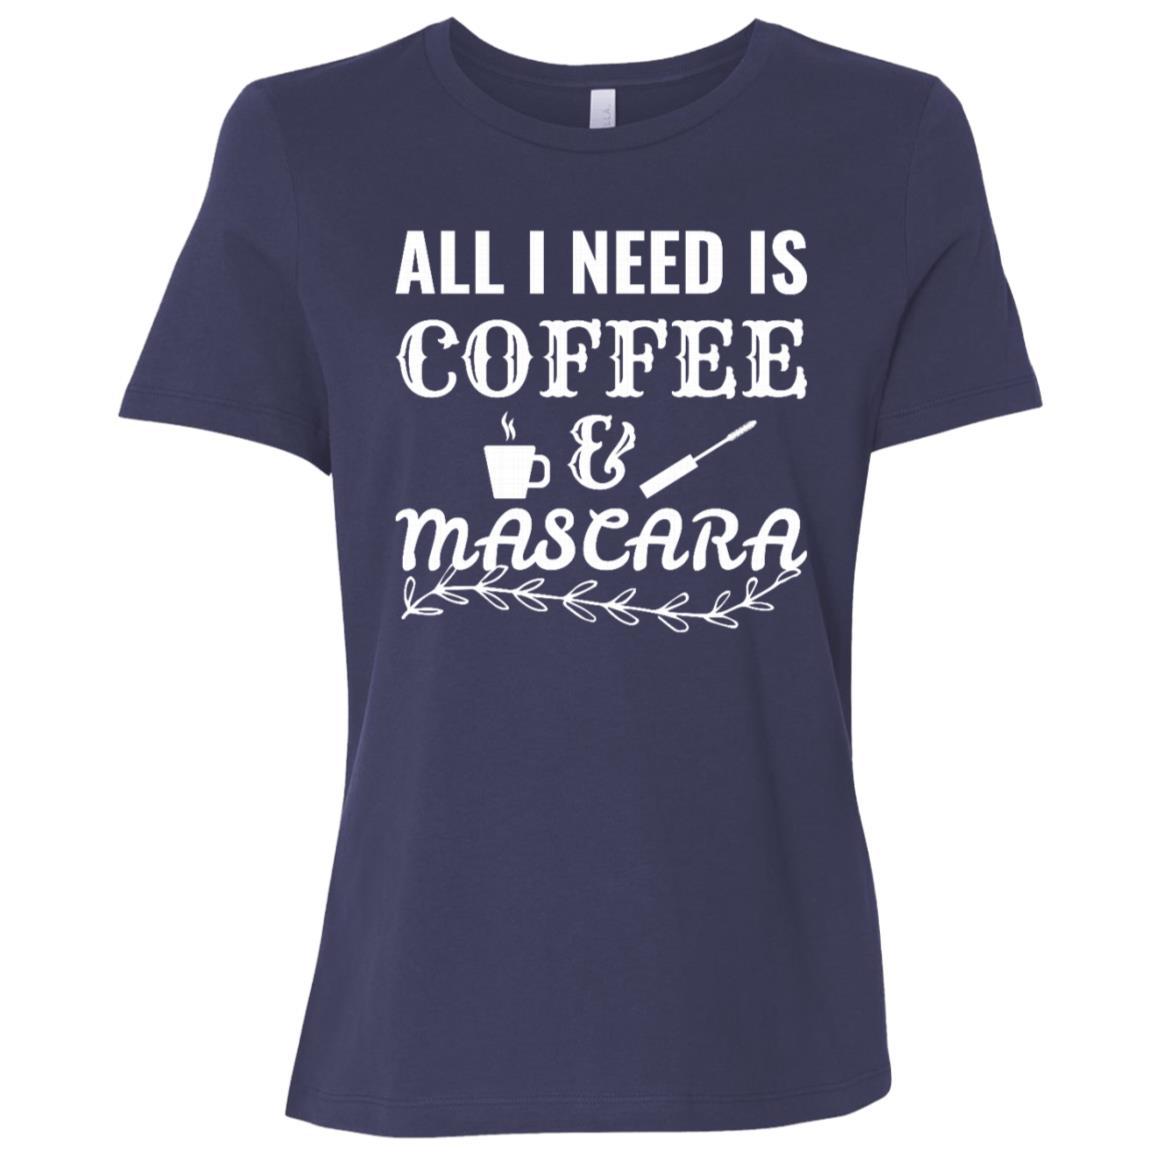 All I Need is Coffee & Mascara Eyelashes Makeup Women Short Sleeve T-Shirt